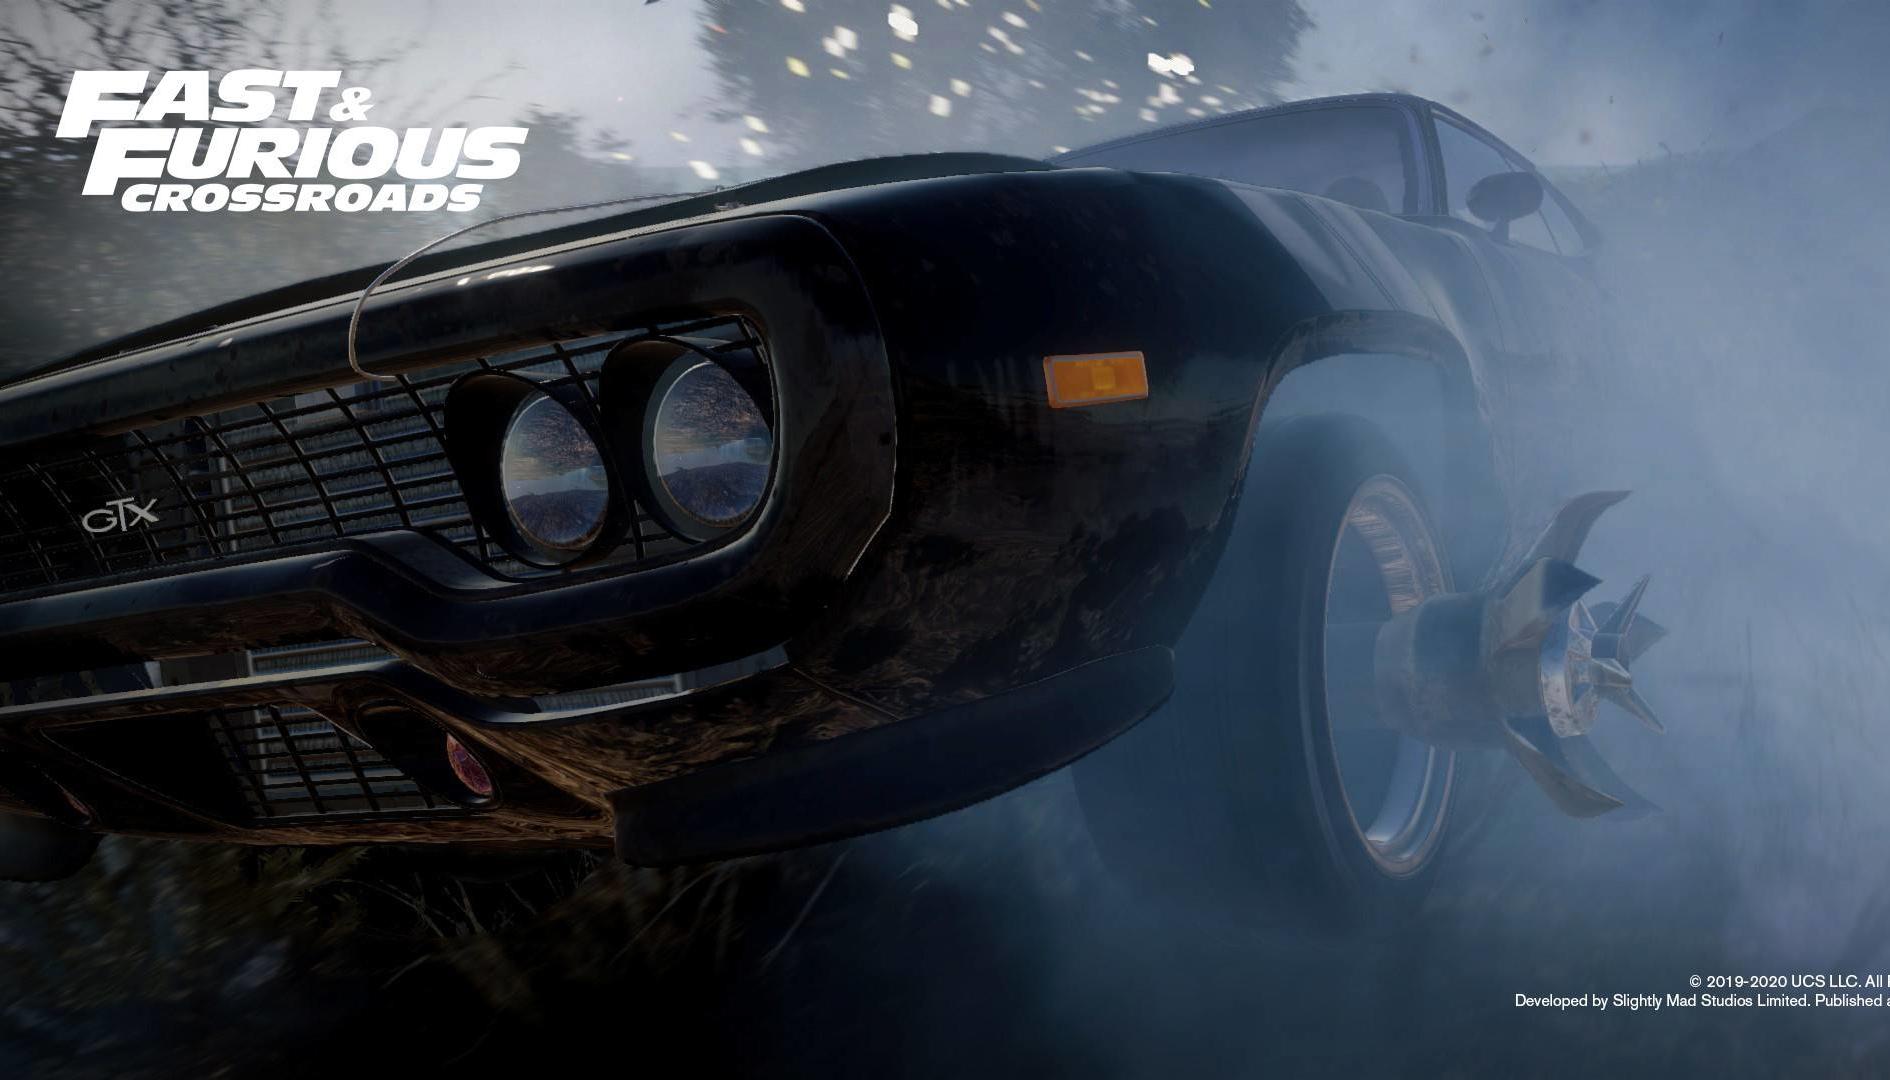 Fast and Furious Crossroads: mostrato il primo trailer durante i Game Awards